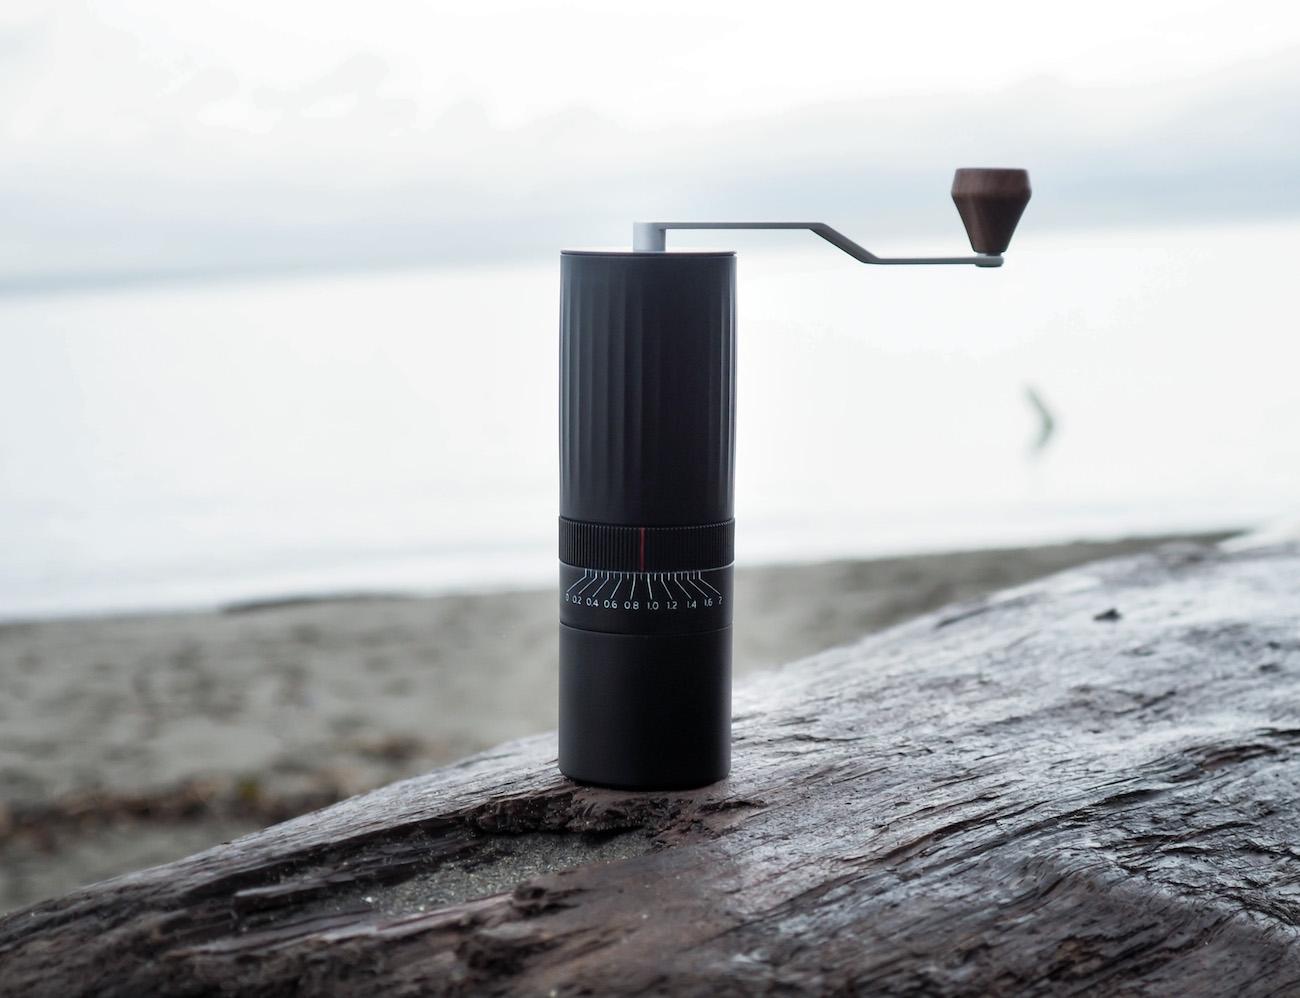 Hiku Premium Hand Coffee Grinder